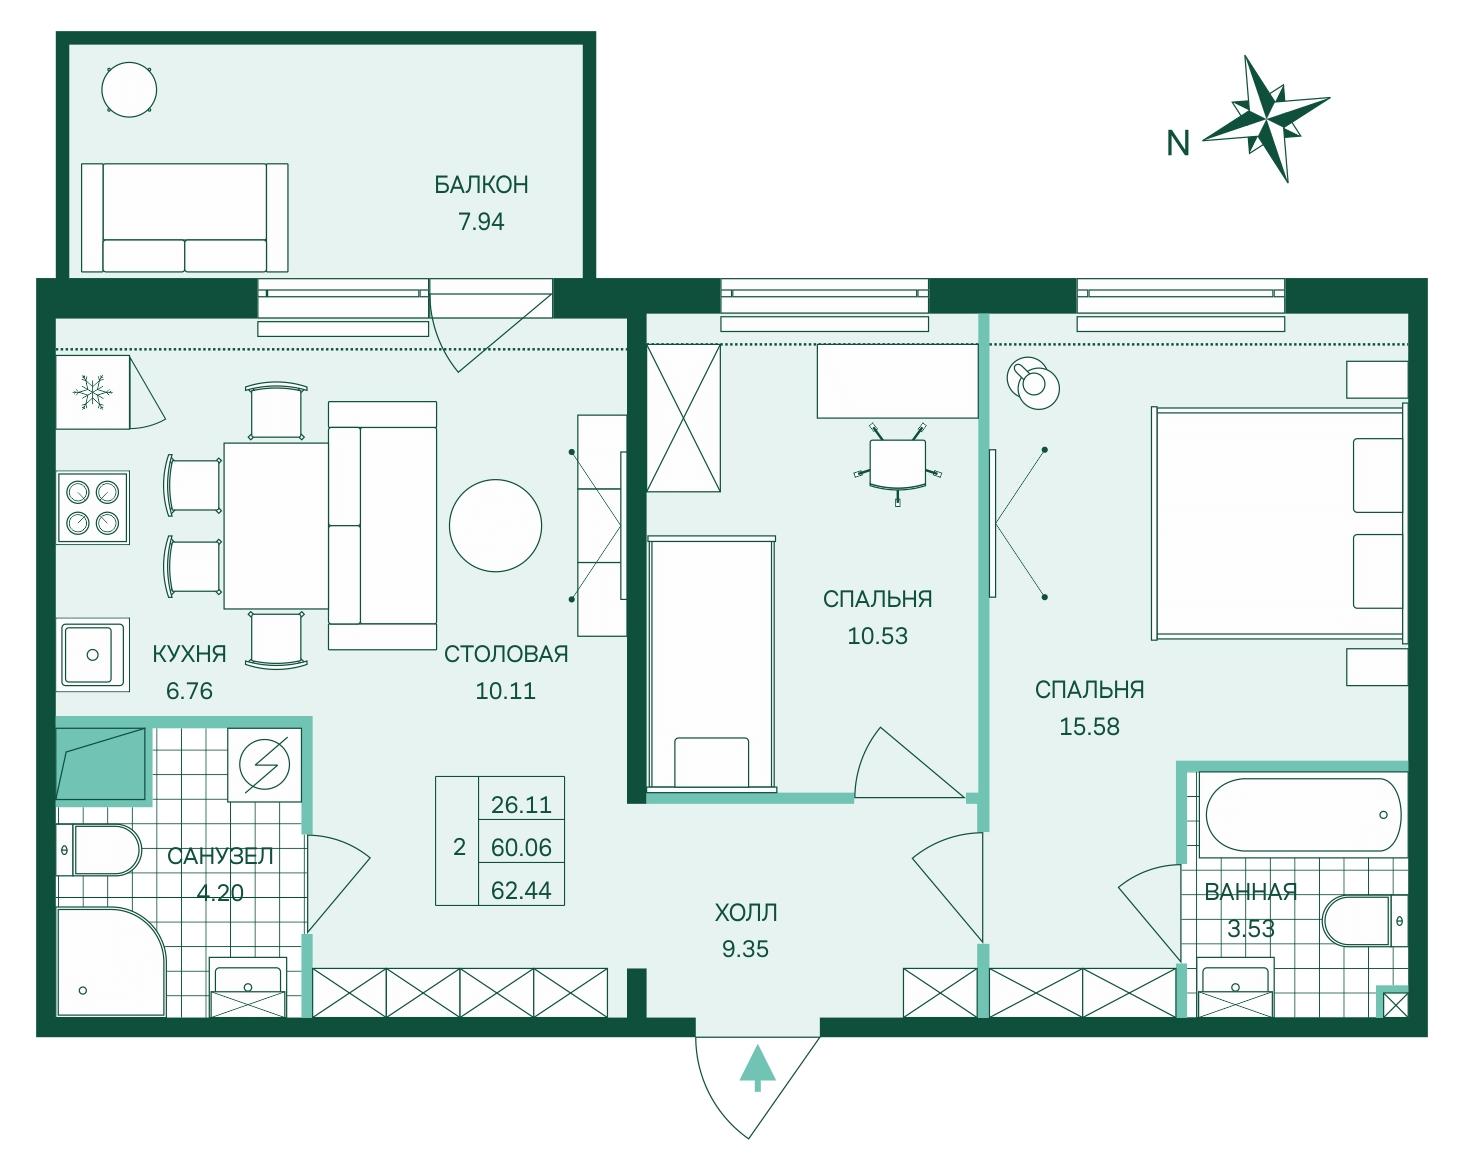 Планировка Трёхкомнатная квартира (Евро) площадью 62.44 кв.м в ЖК «Skandi Klubb»